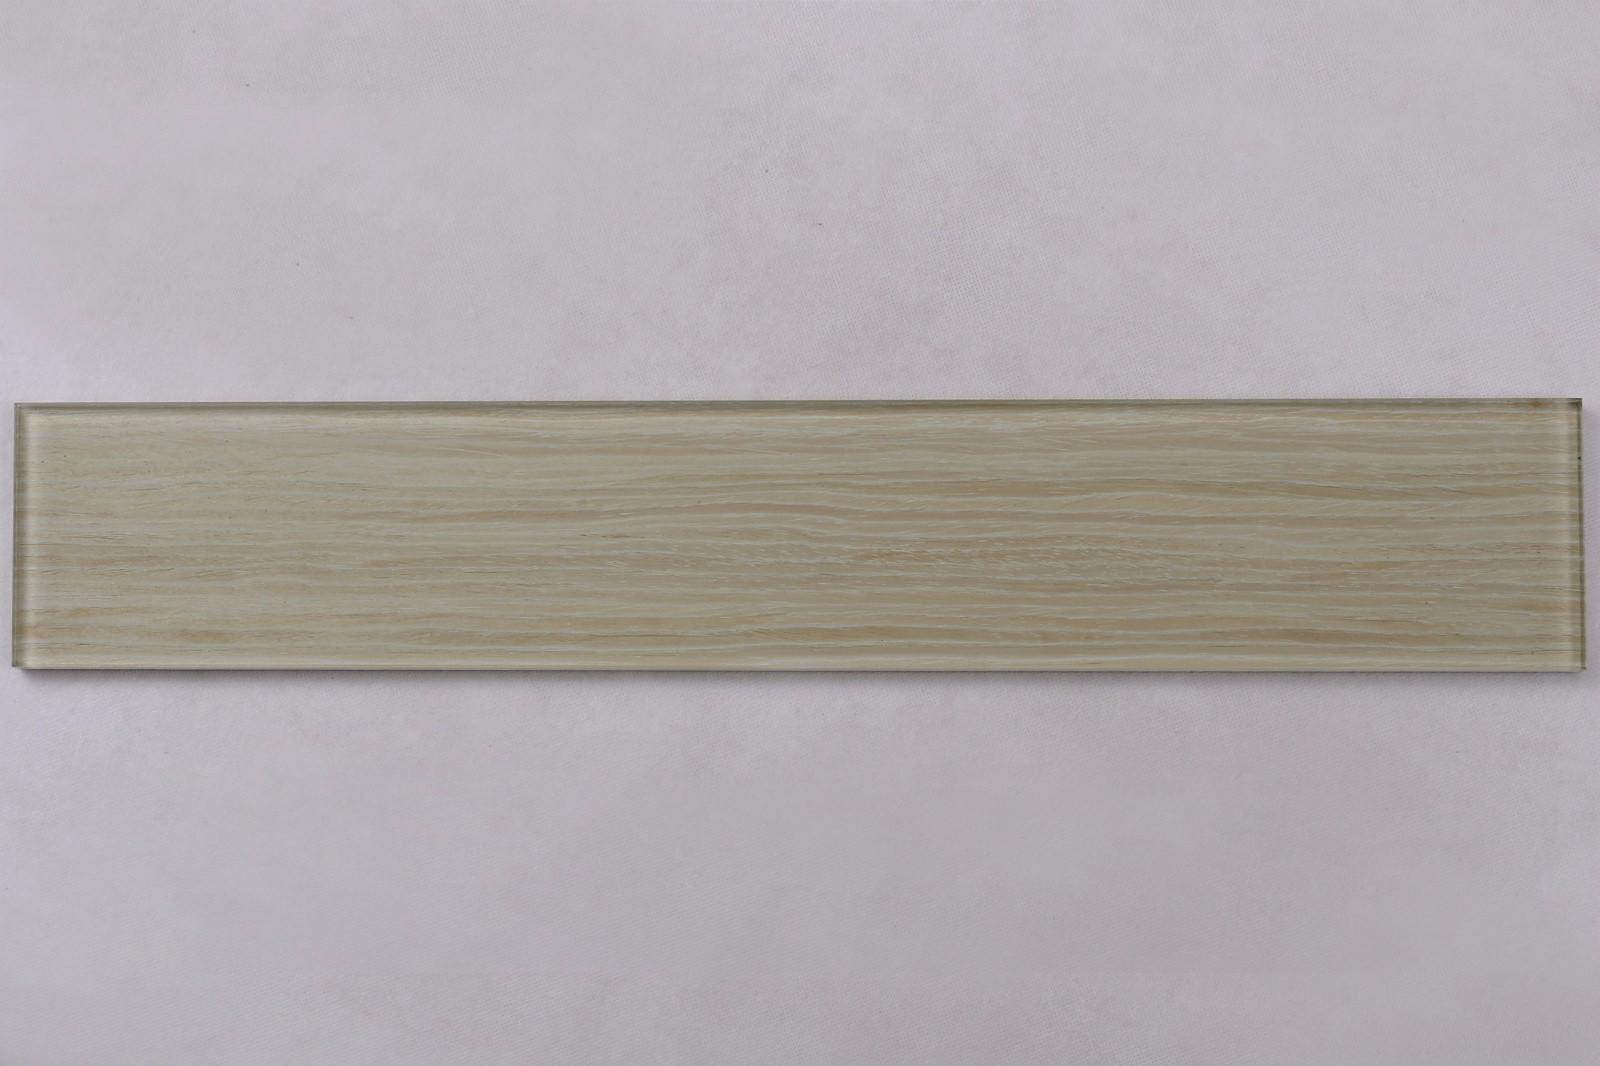 beveled green glass mosaic tile herringbone manufacturers for living room-1